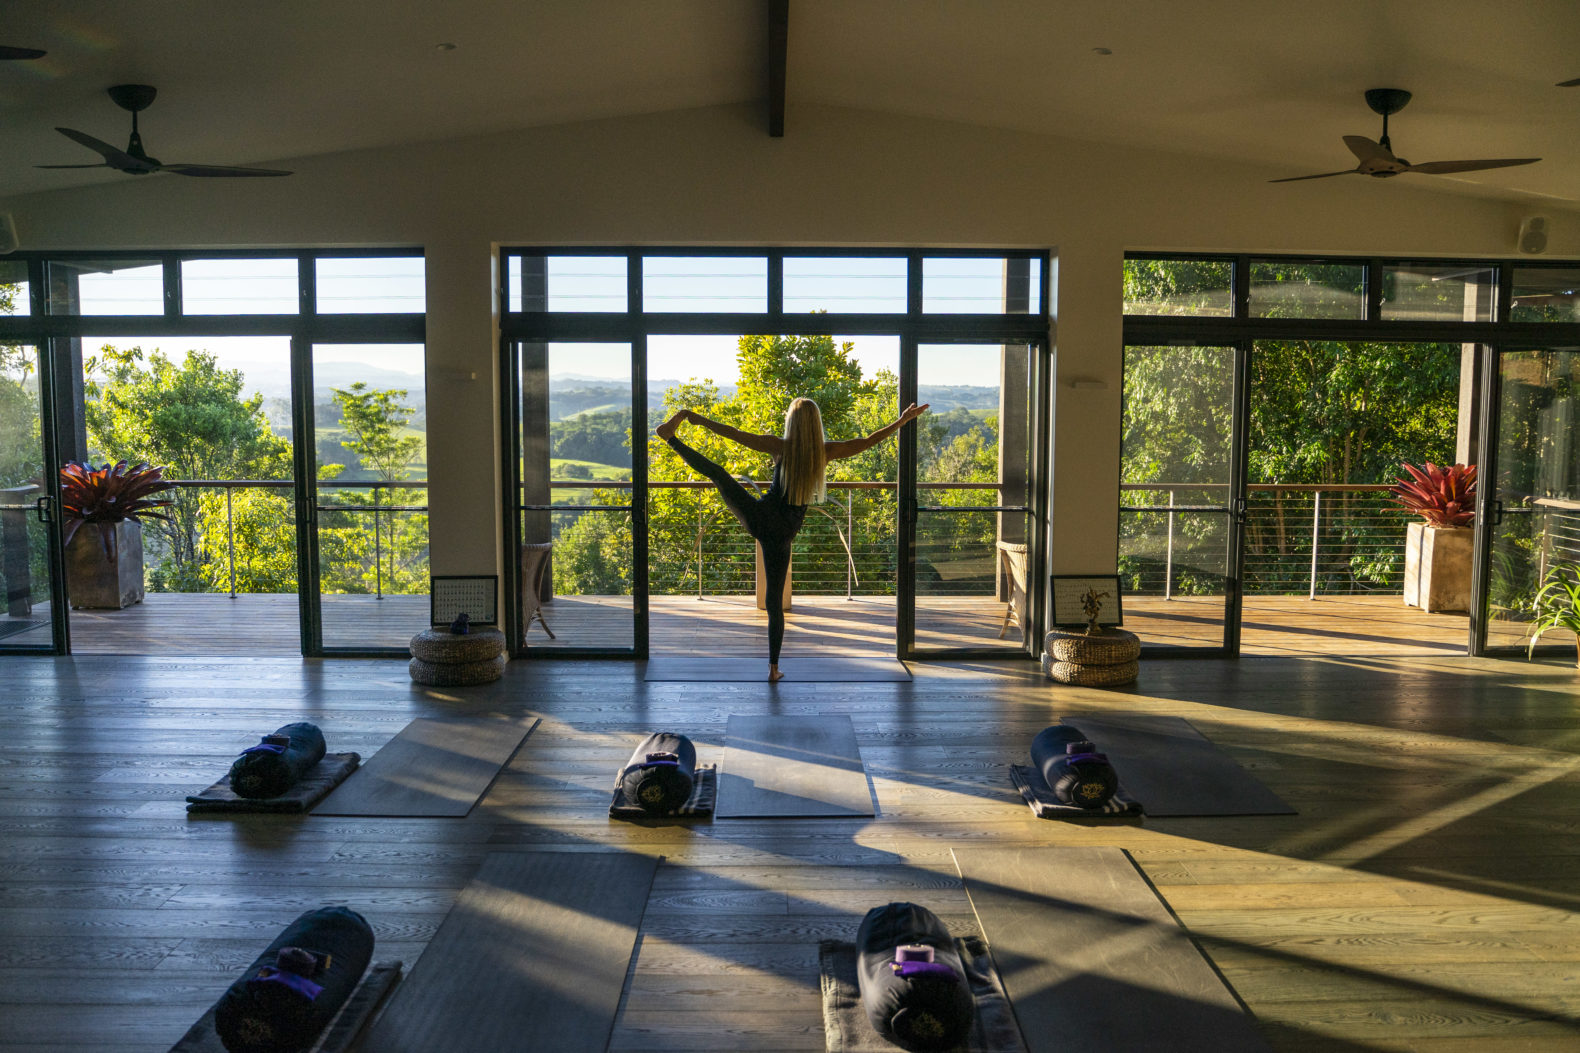 light-samadhi-yoga-room-gaia-retreat-spa-healing-hotel-australia